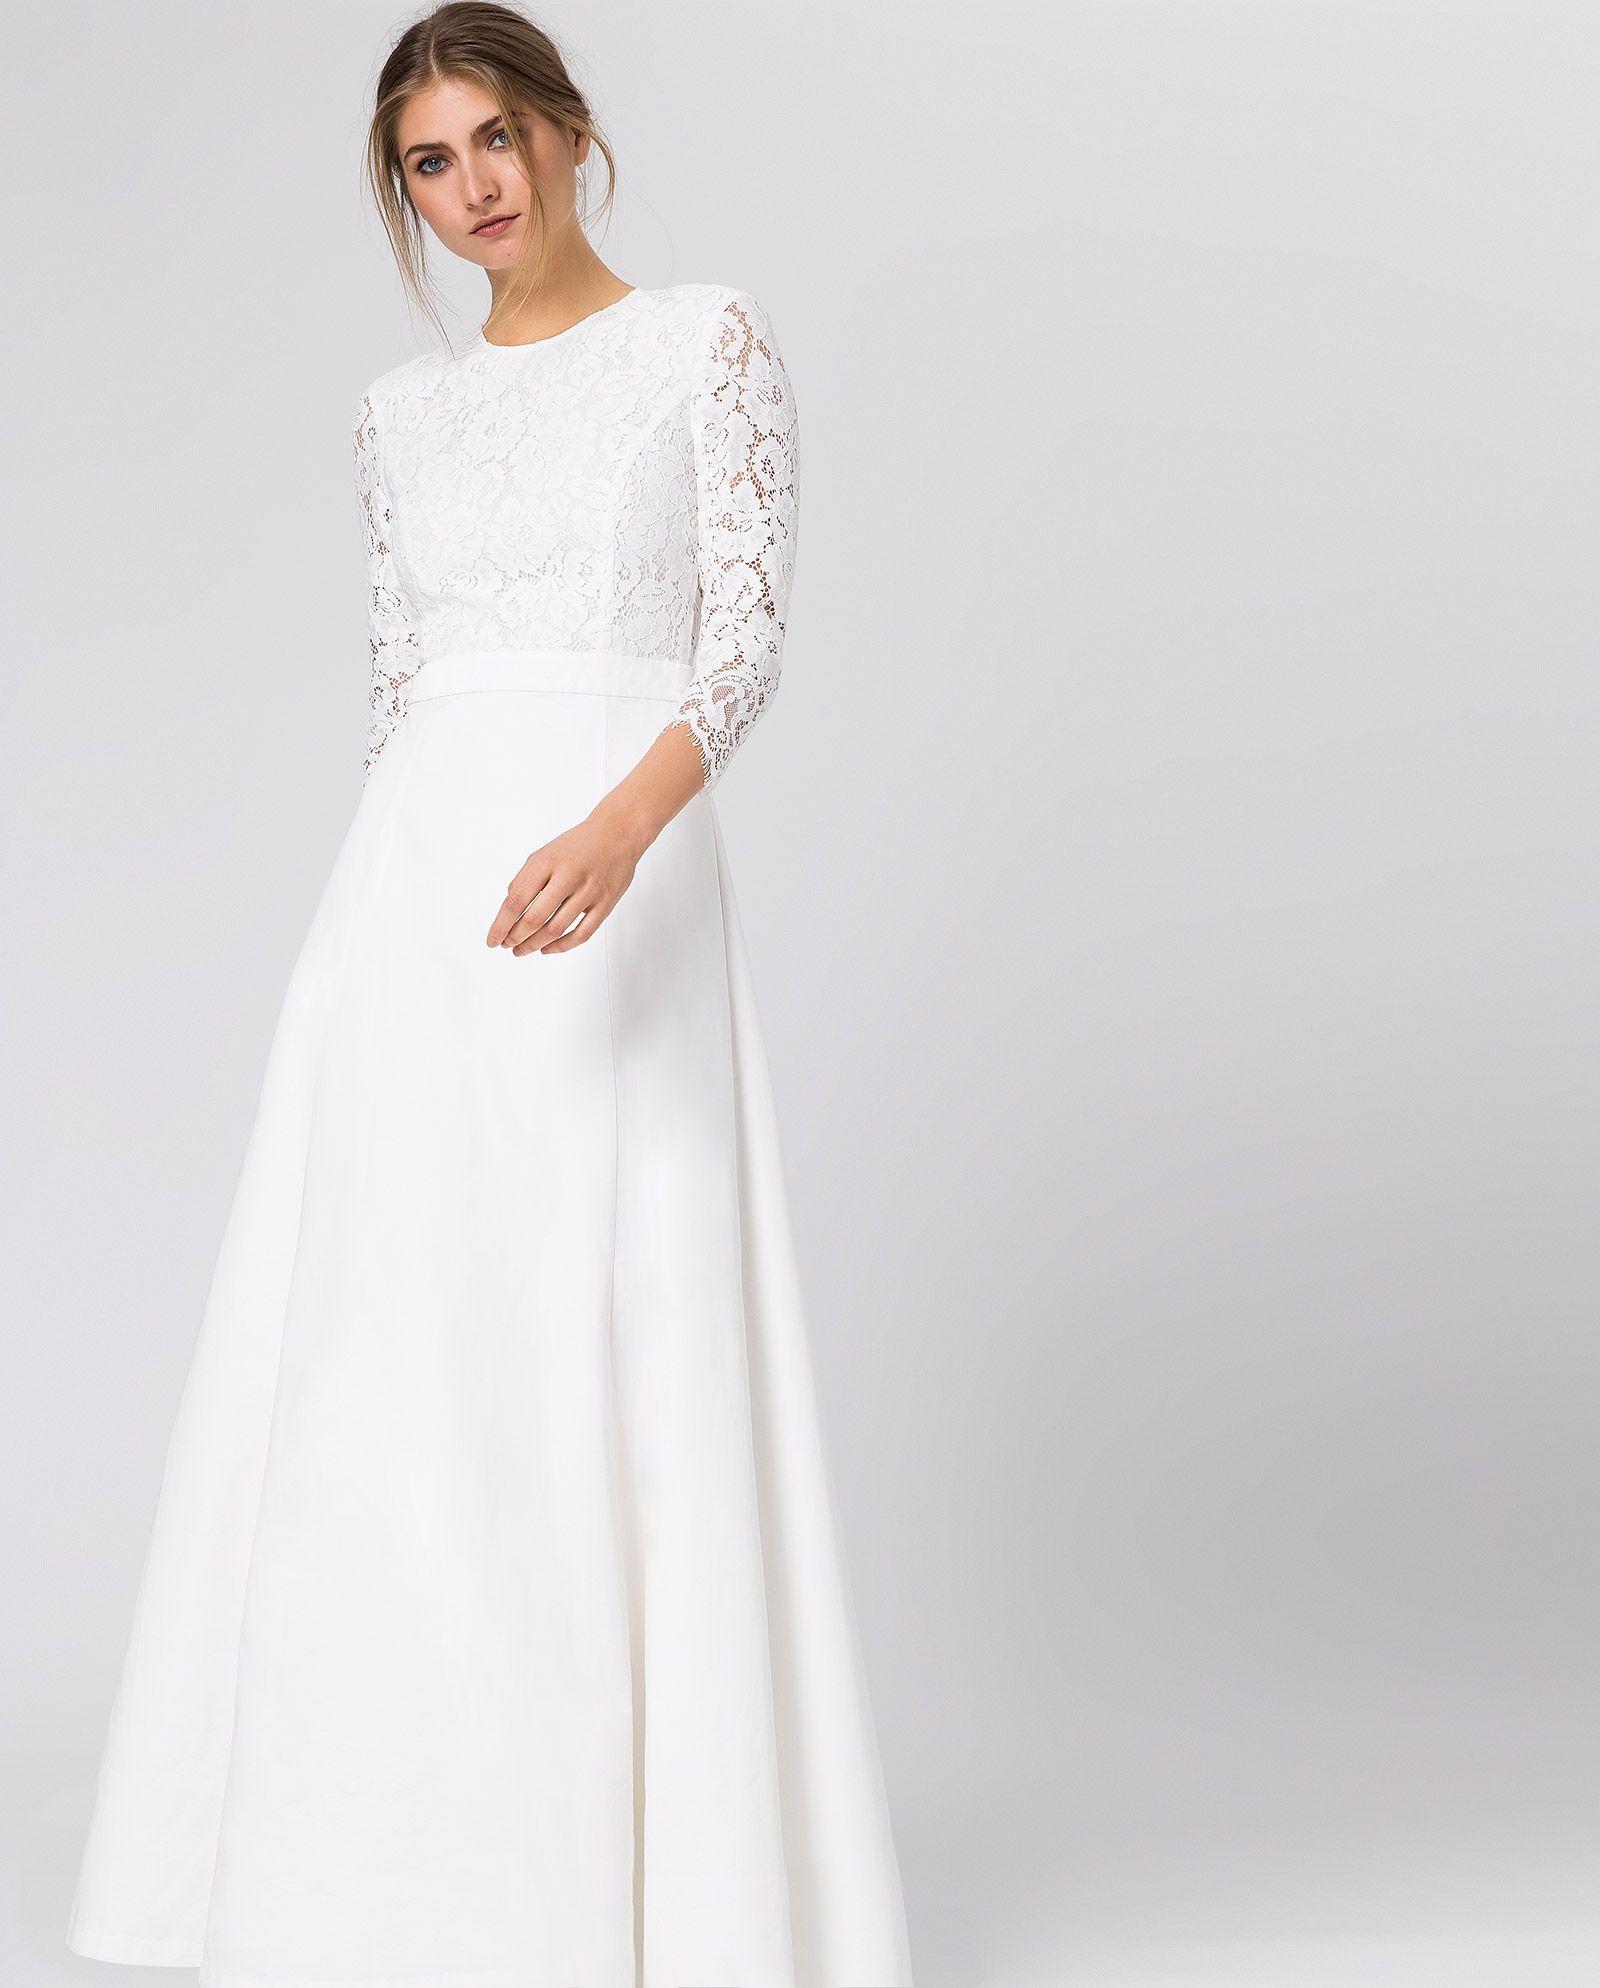 Bridal Sleeve Dress 122-in-12 - Snow White - IVY & OAK  Kleid